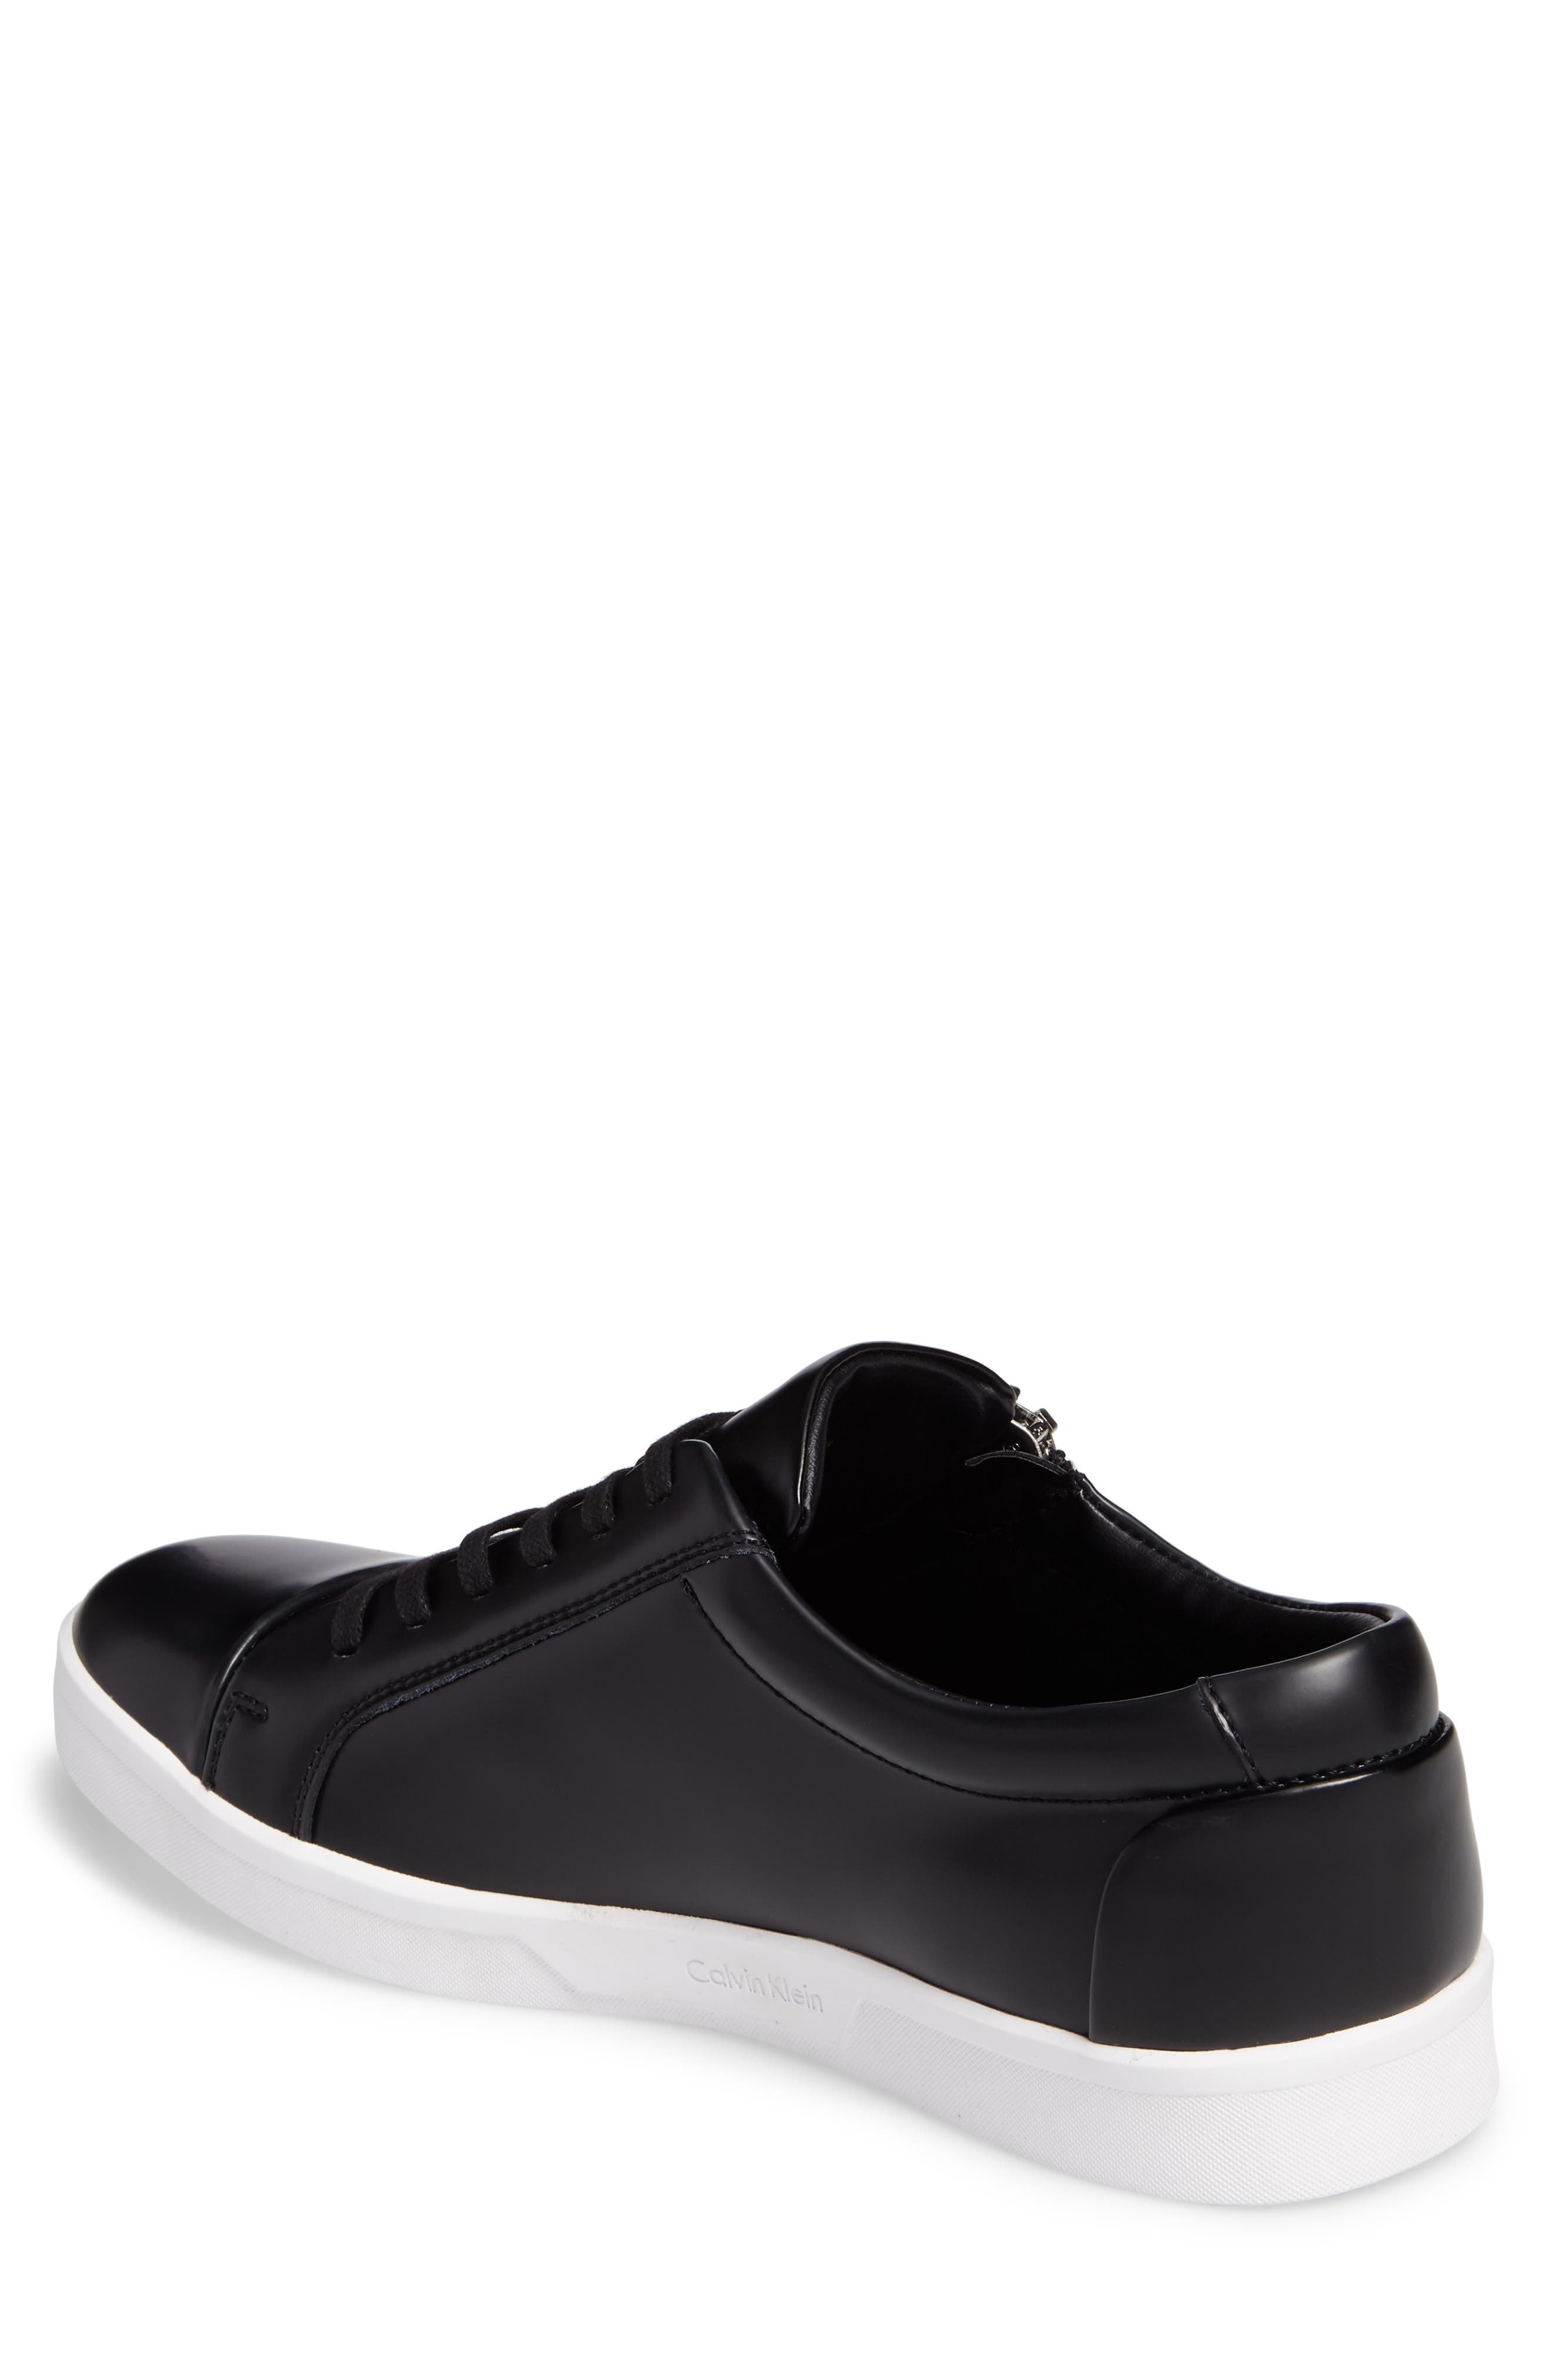 Alternate Image 2  - Calvin Klein Ibrahim Cap-Toe Zip Sneaker (Men)